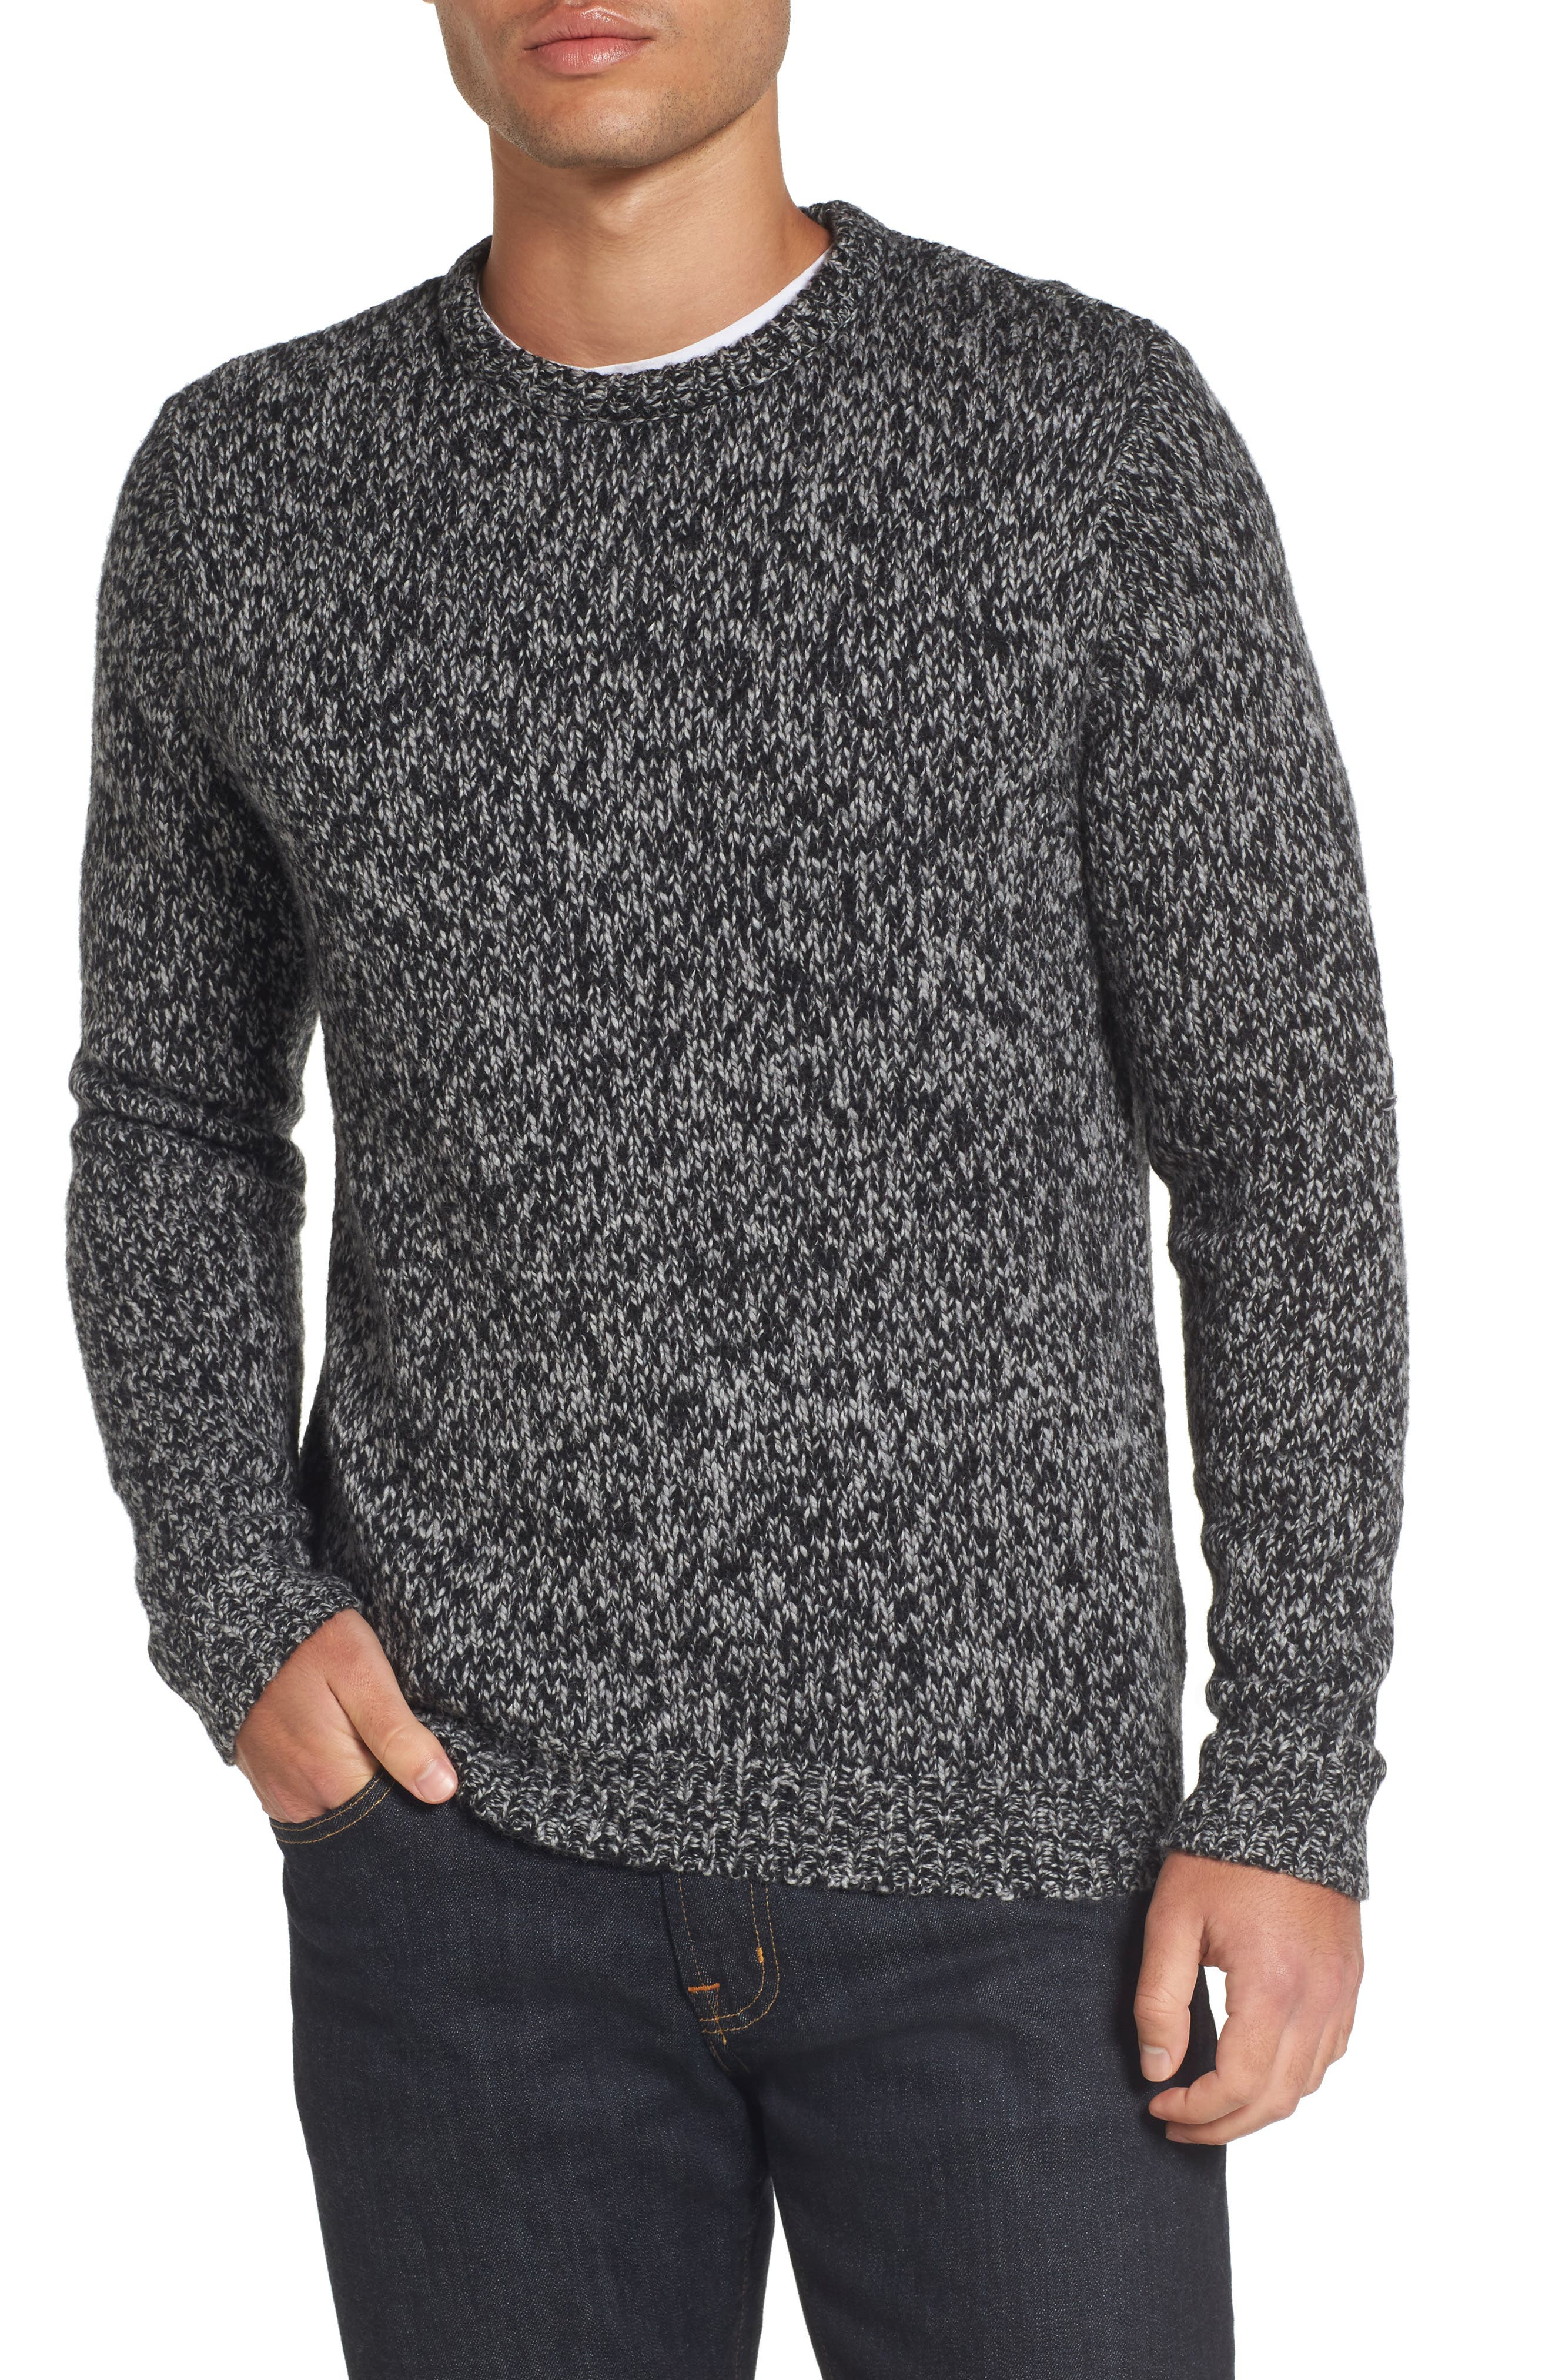 Alternate Image 1 Selected - Nordstrom Men's Shop Marled Yarn Sweater